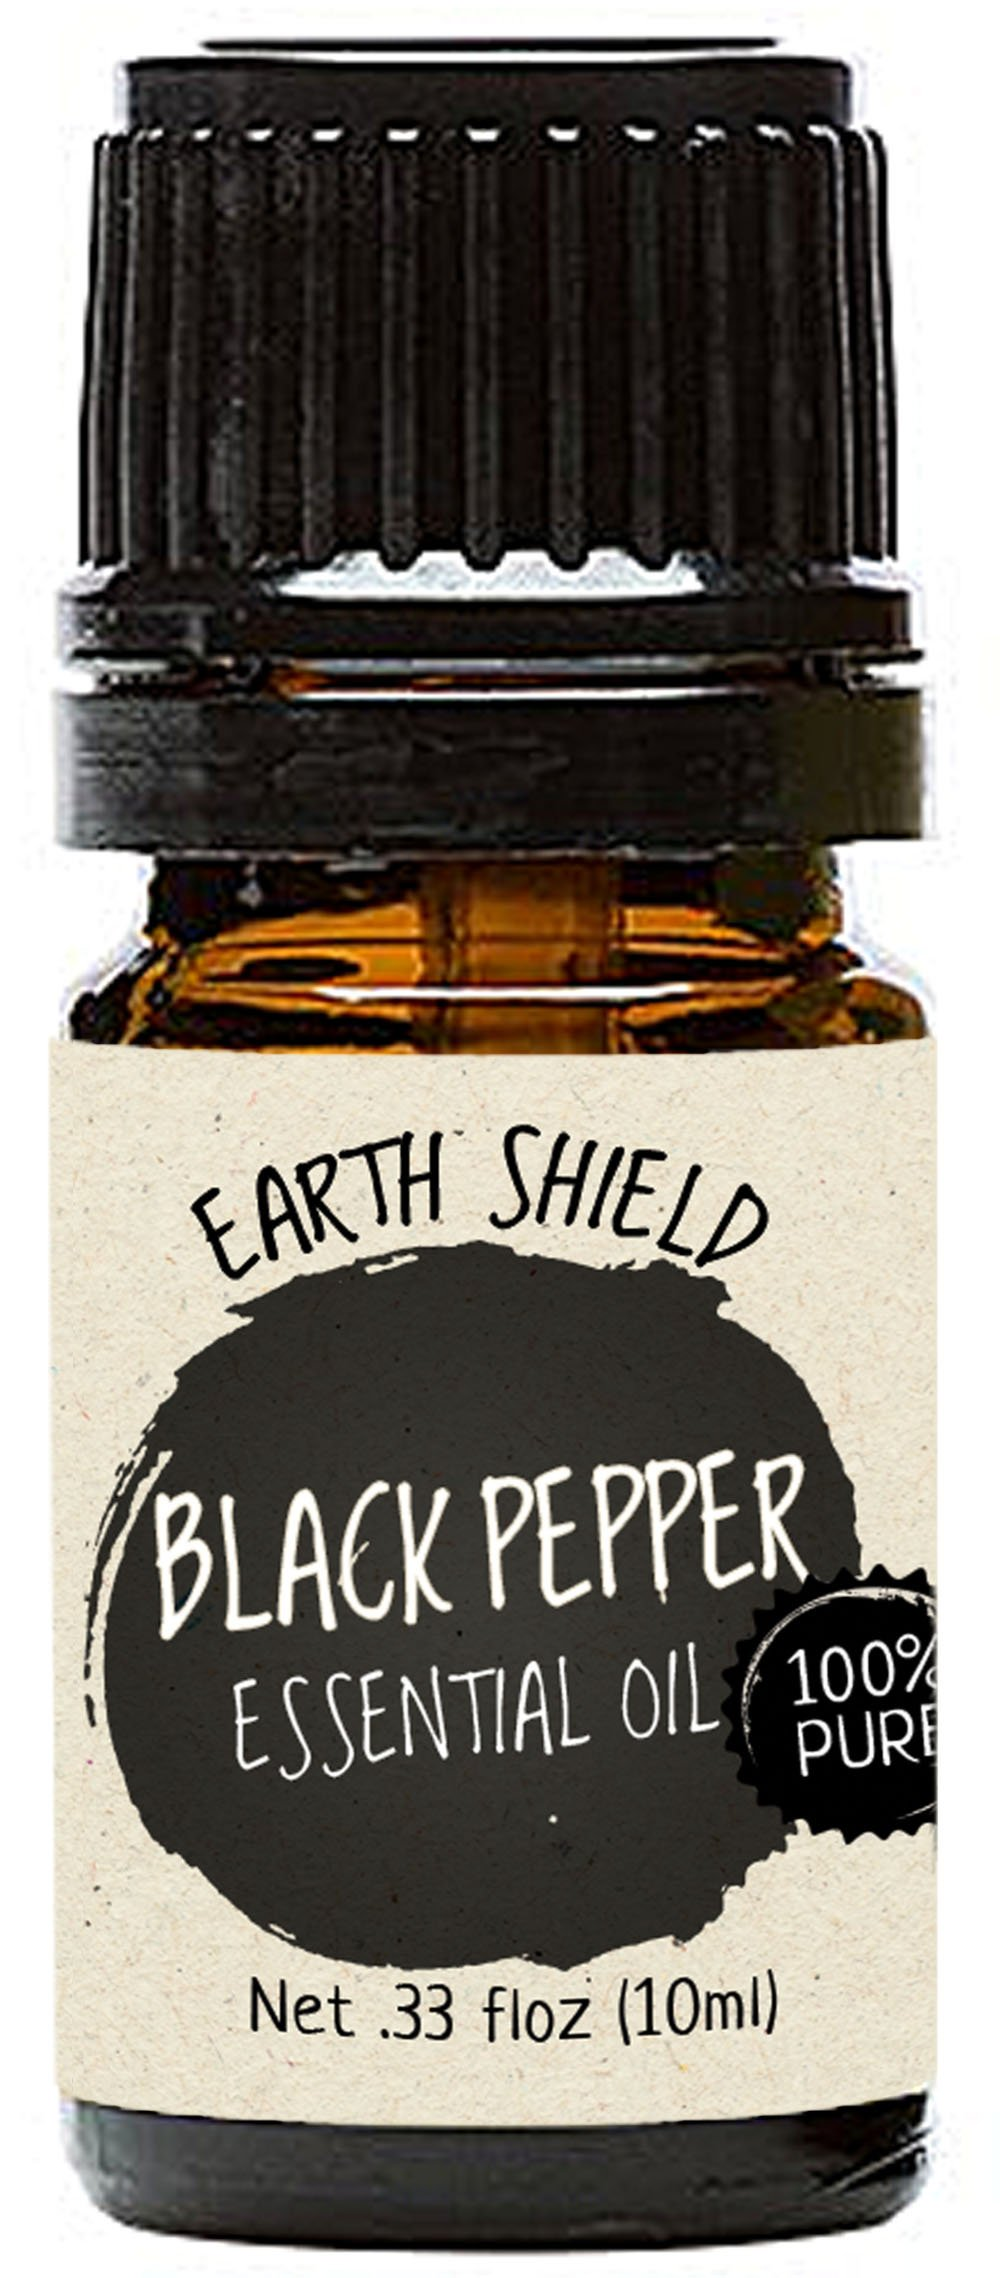 Earth Shield Black Pepper Essential Oil is 100% Pure and Therapeutic Grade - 10ml.